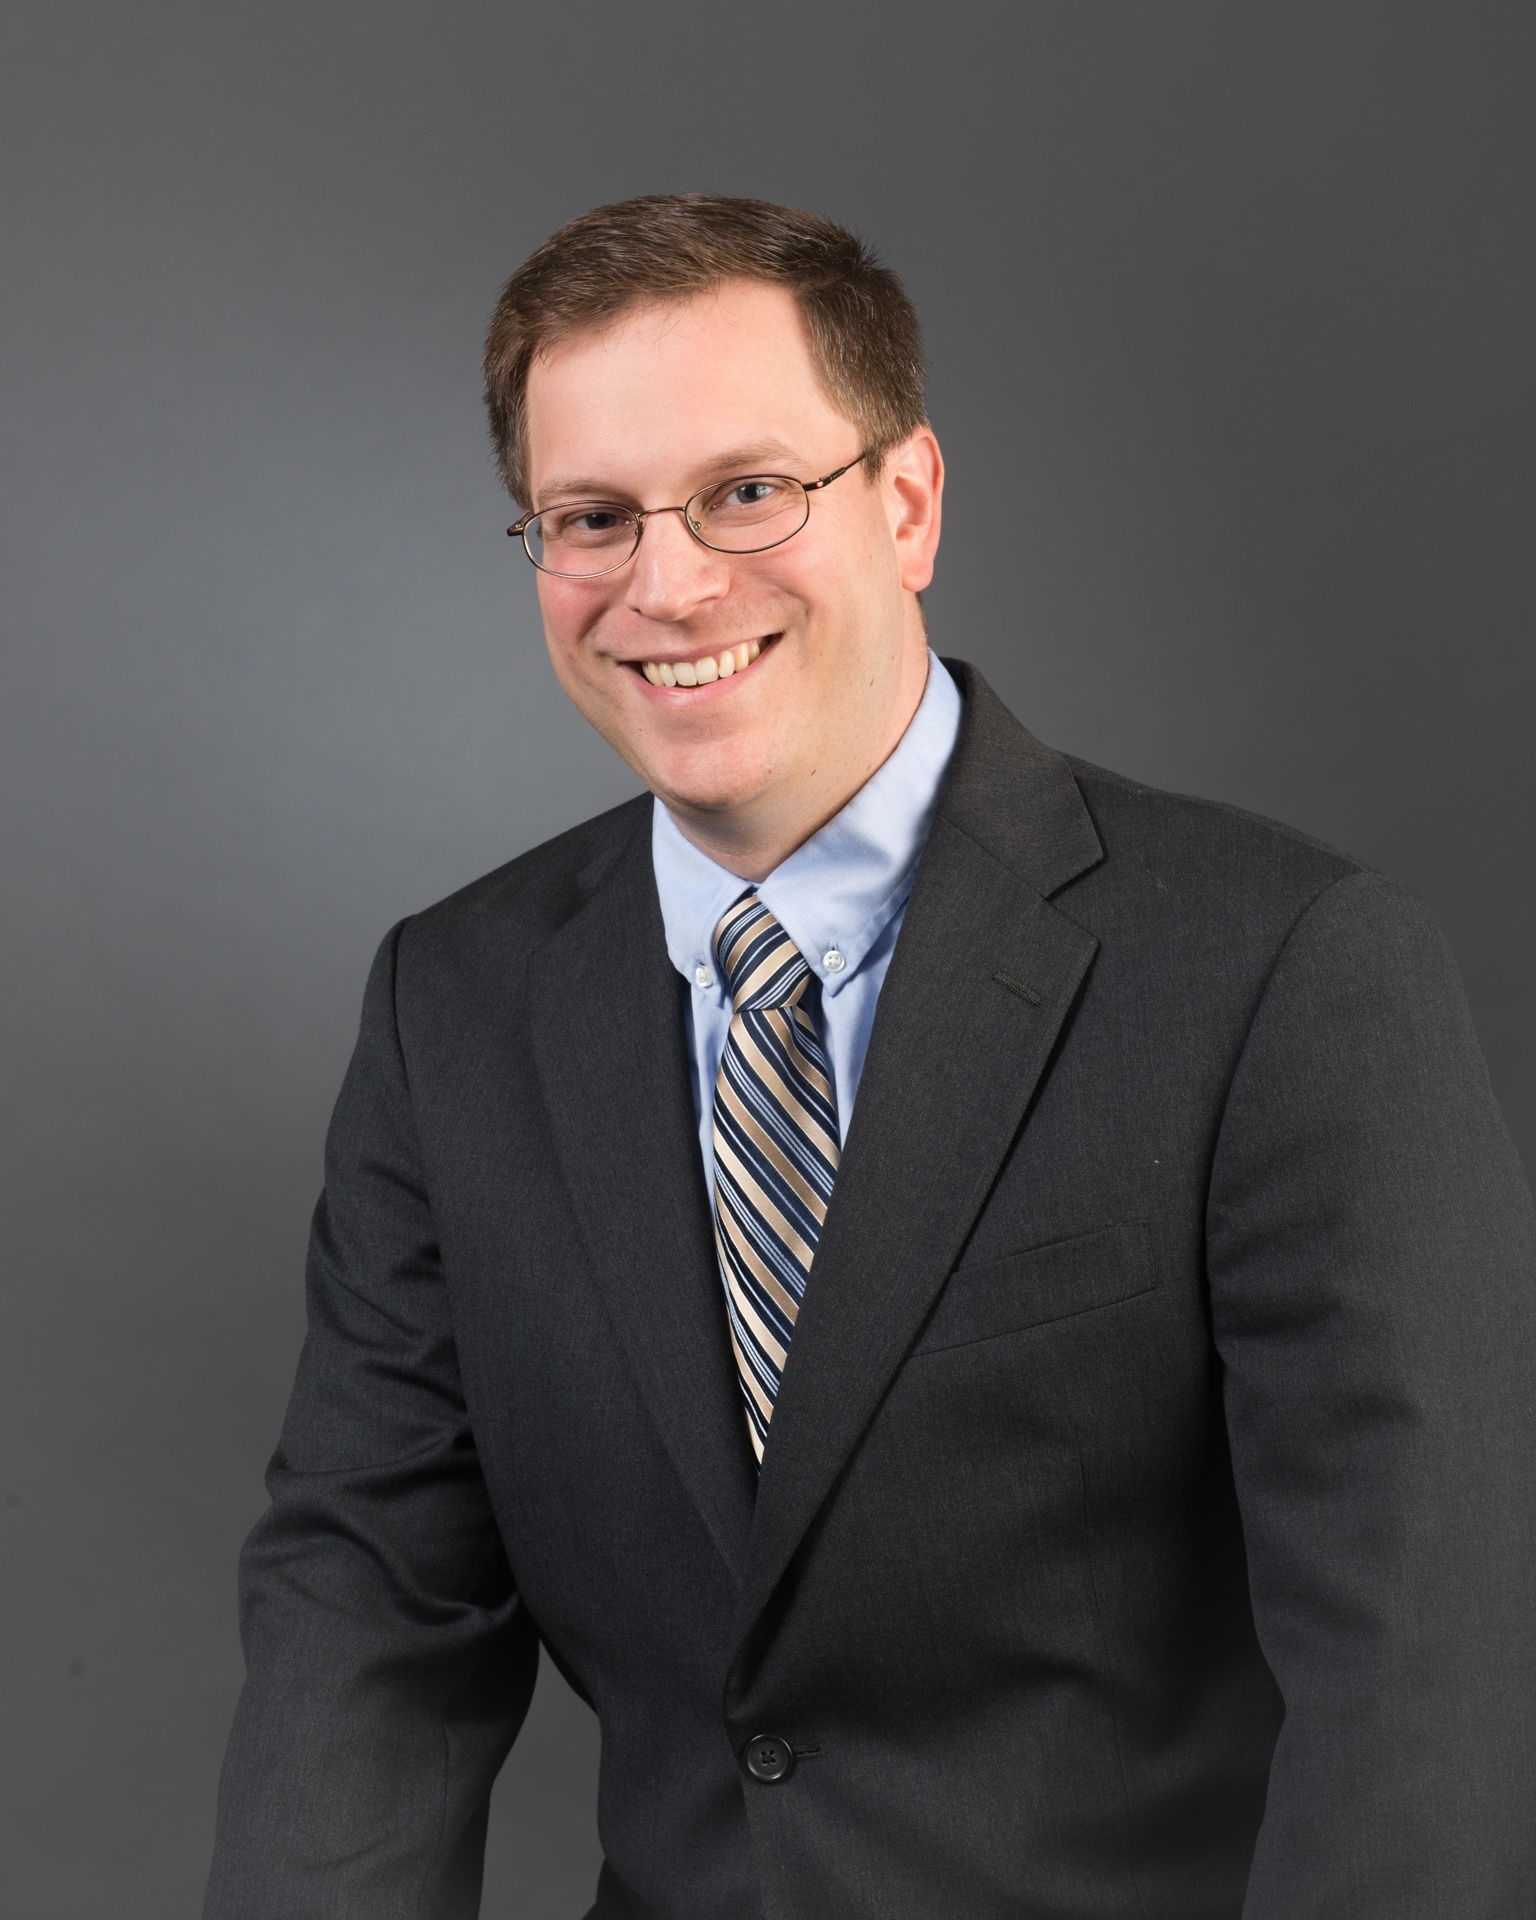 PBA Senior Associate, Andrew Luzenski, PE, LEED AP to Present May 9 at Energy Efficiency Conference & Exhibit, Novi, MI